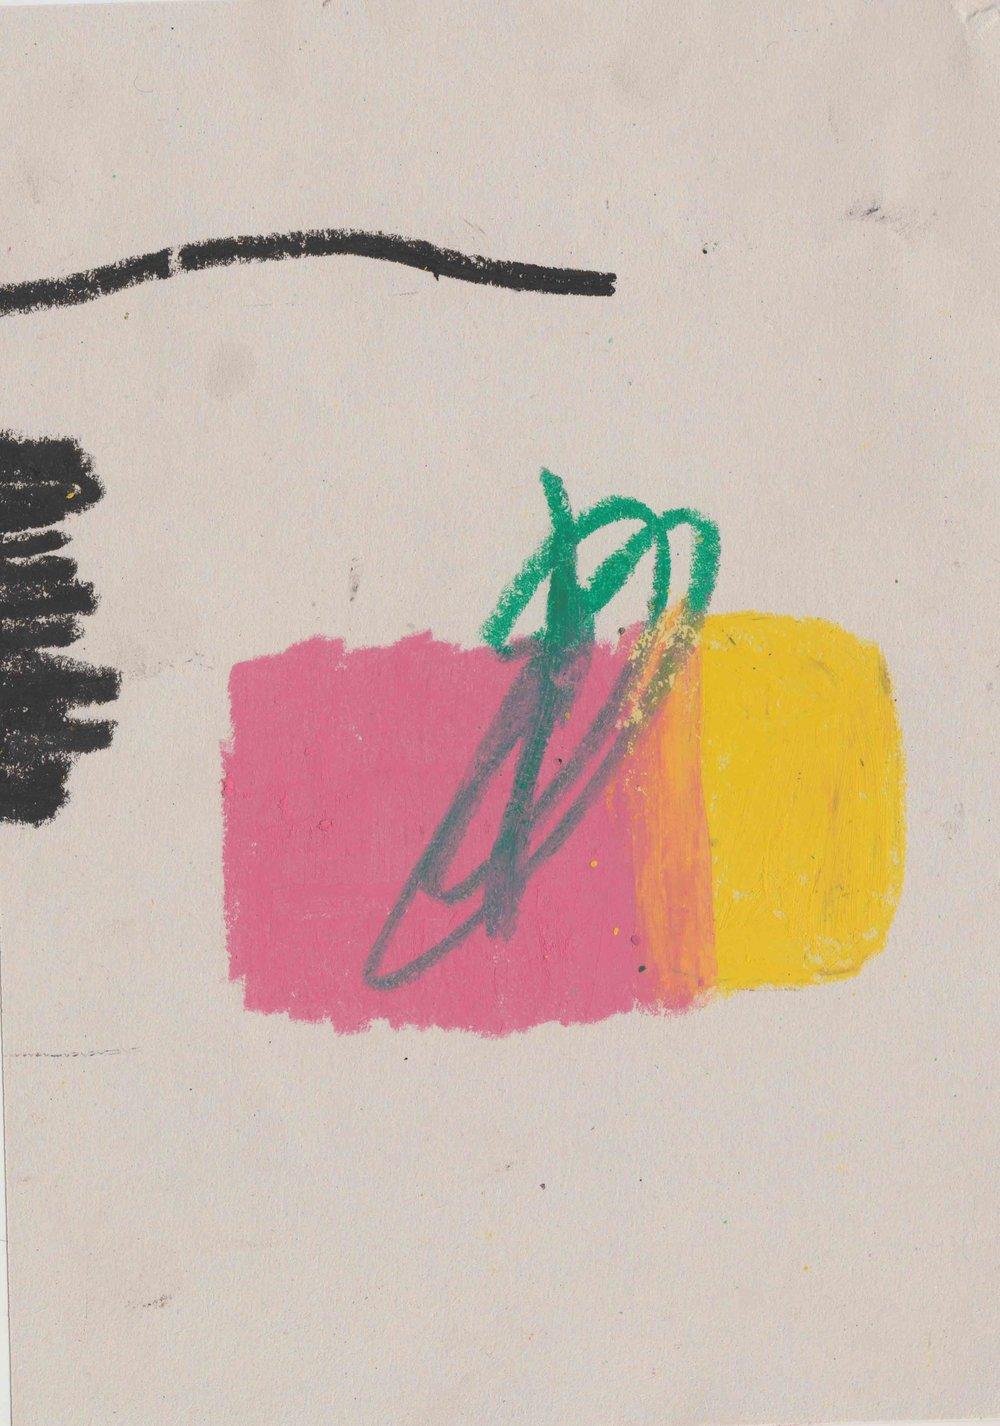 Pastel on Paper // Jan 2018